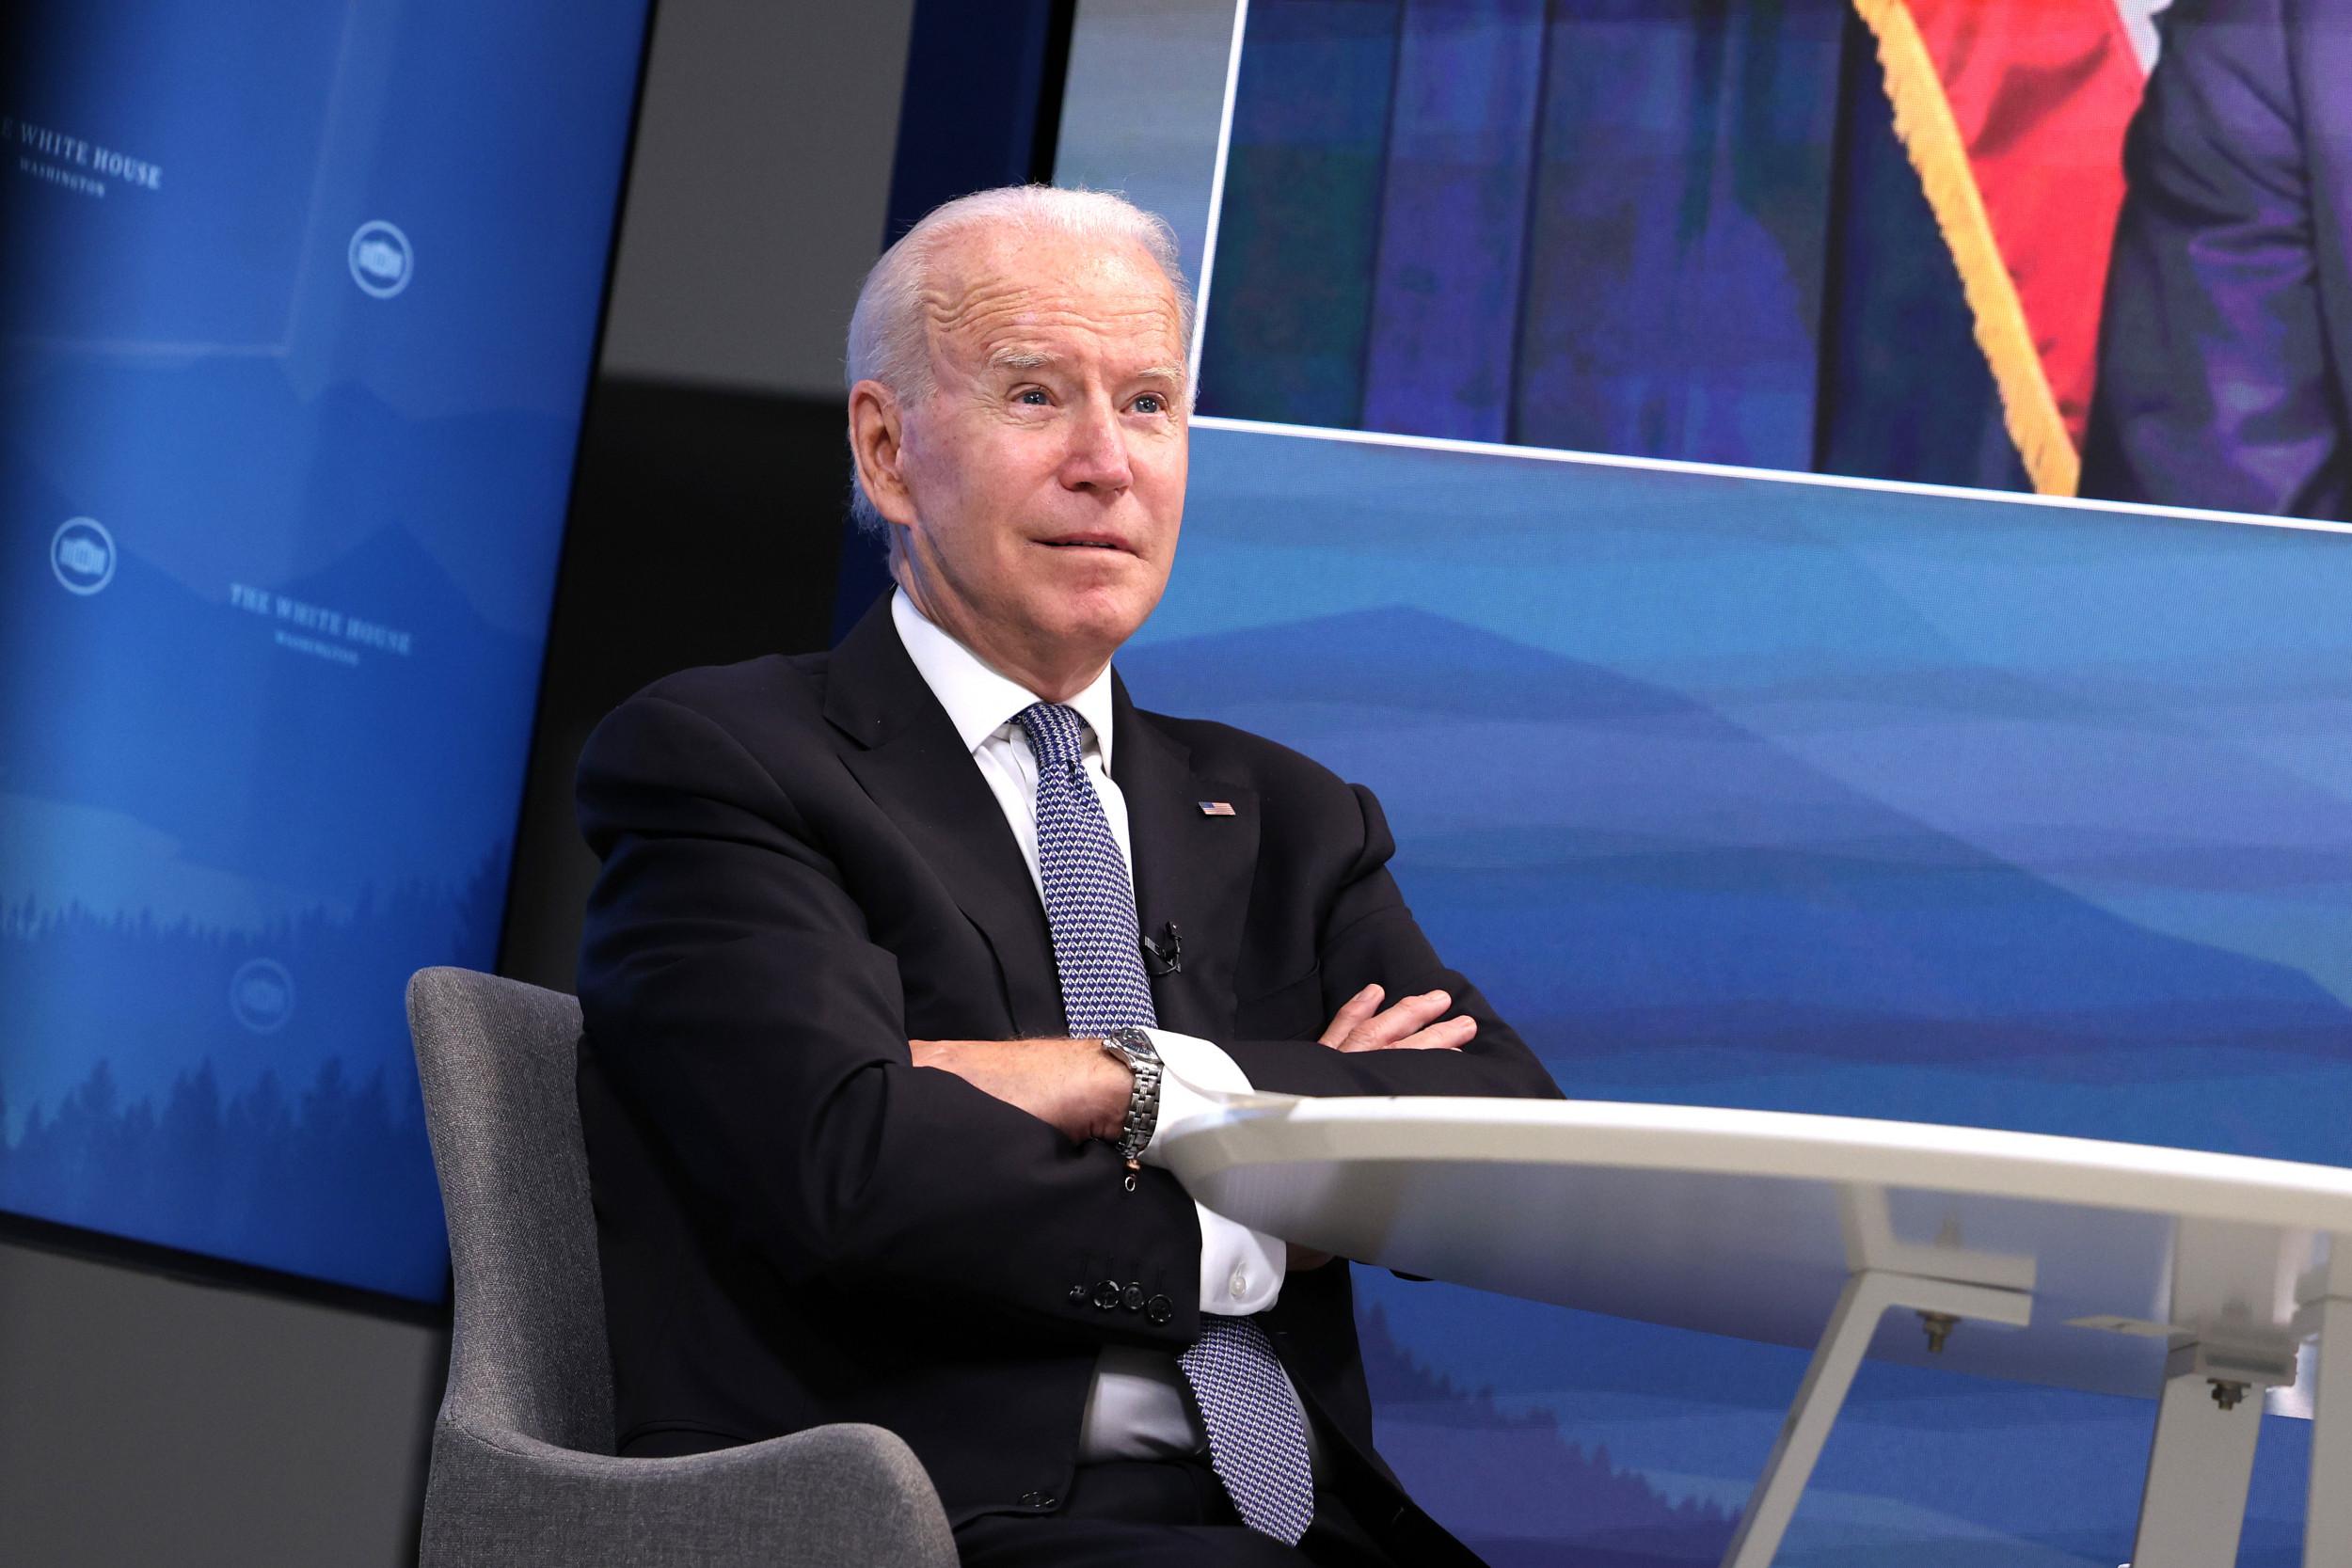 The Easy Climate-Change Win that Rashida Tlaib Backs But Joe Biden Fails to Seize - Newsweek